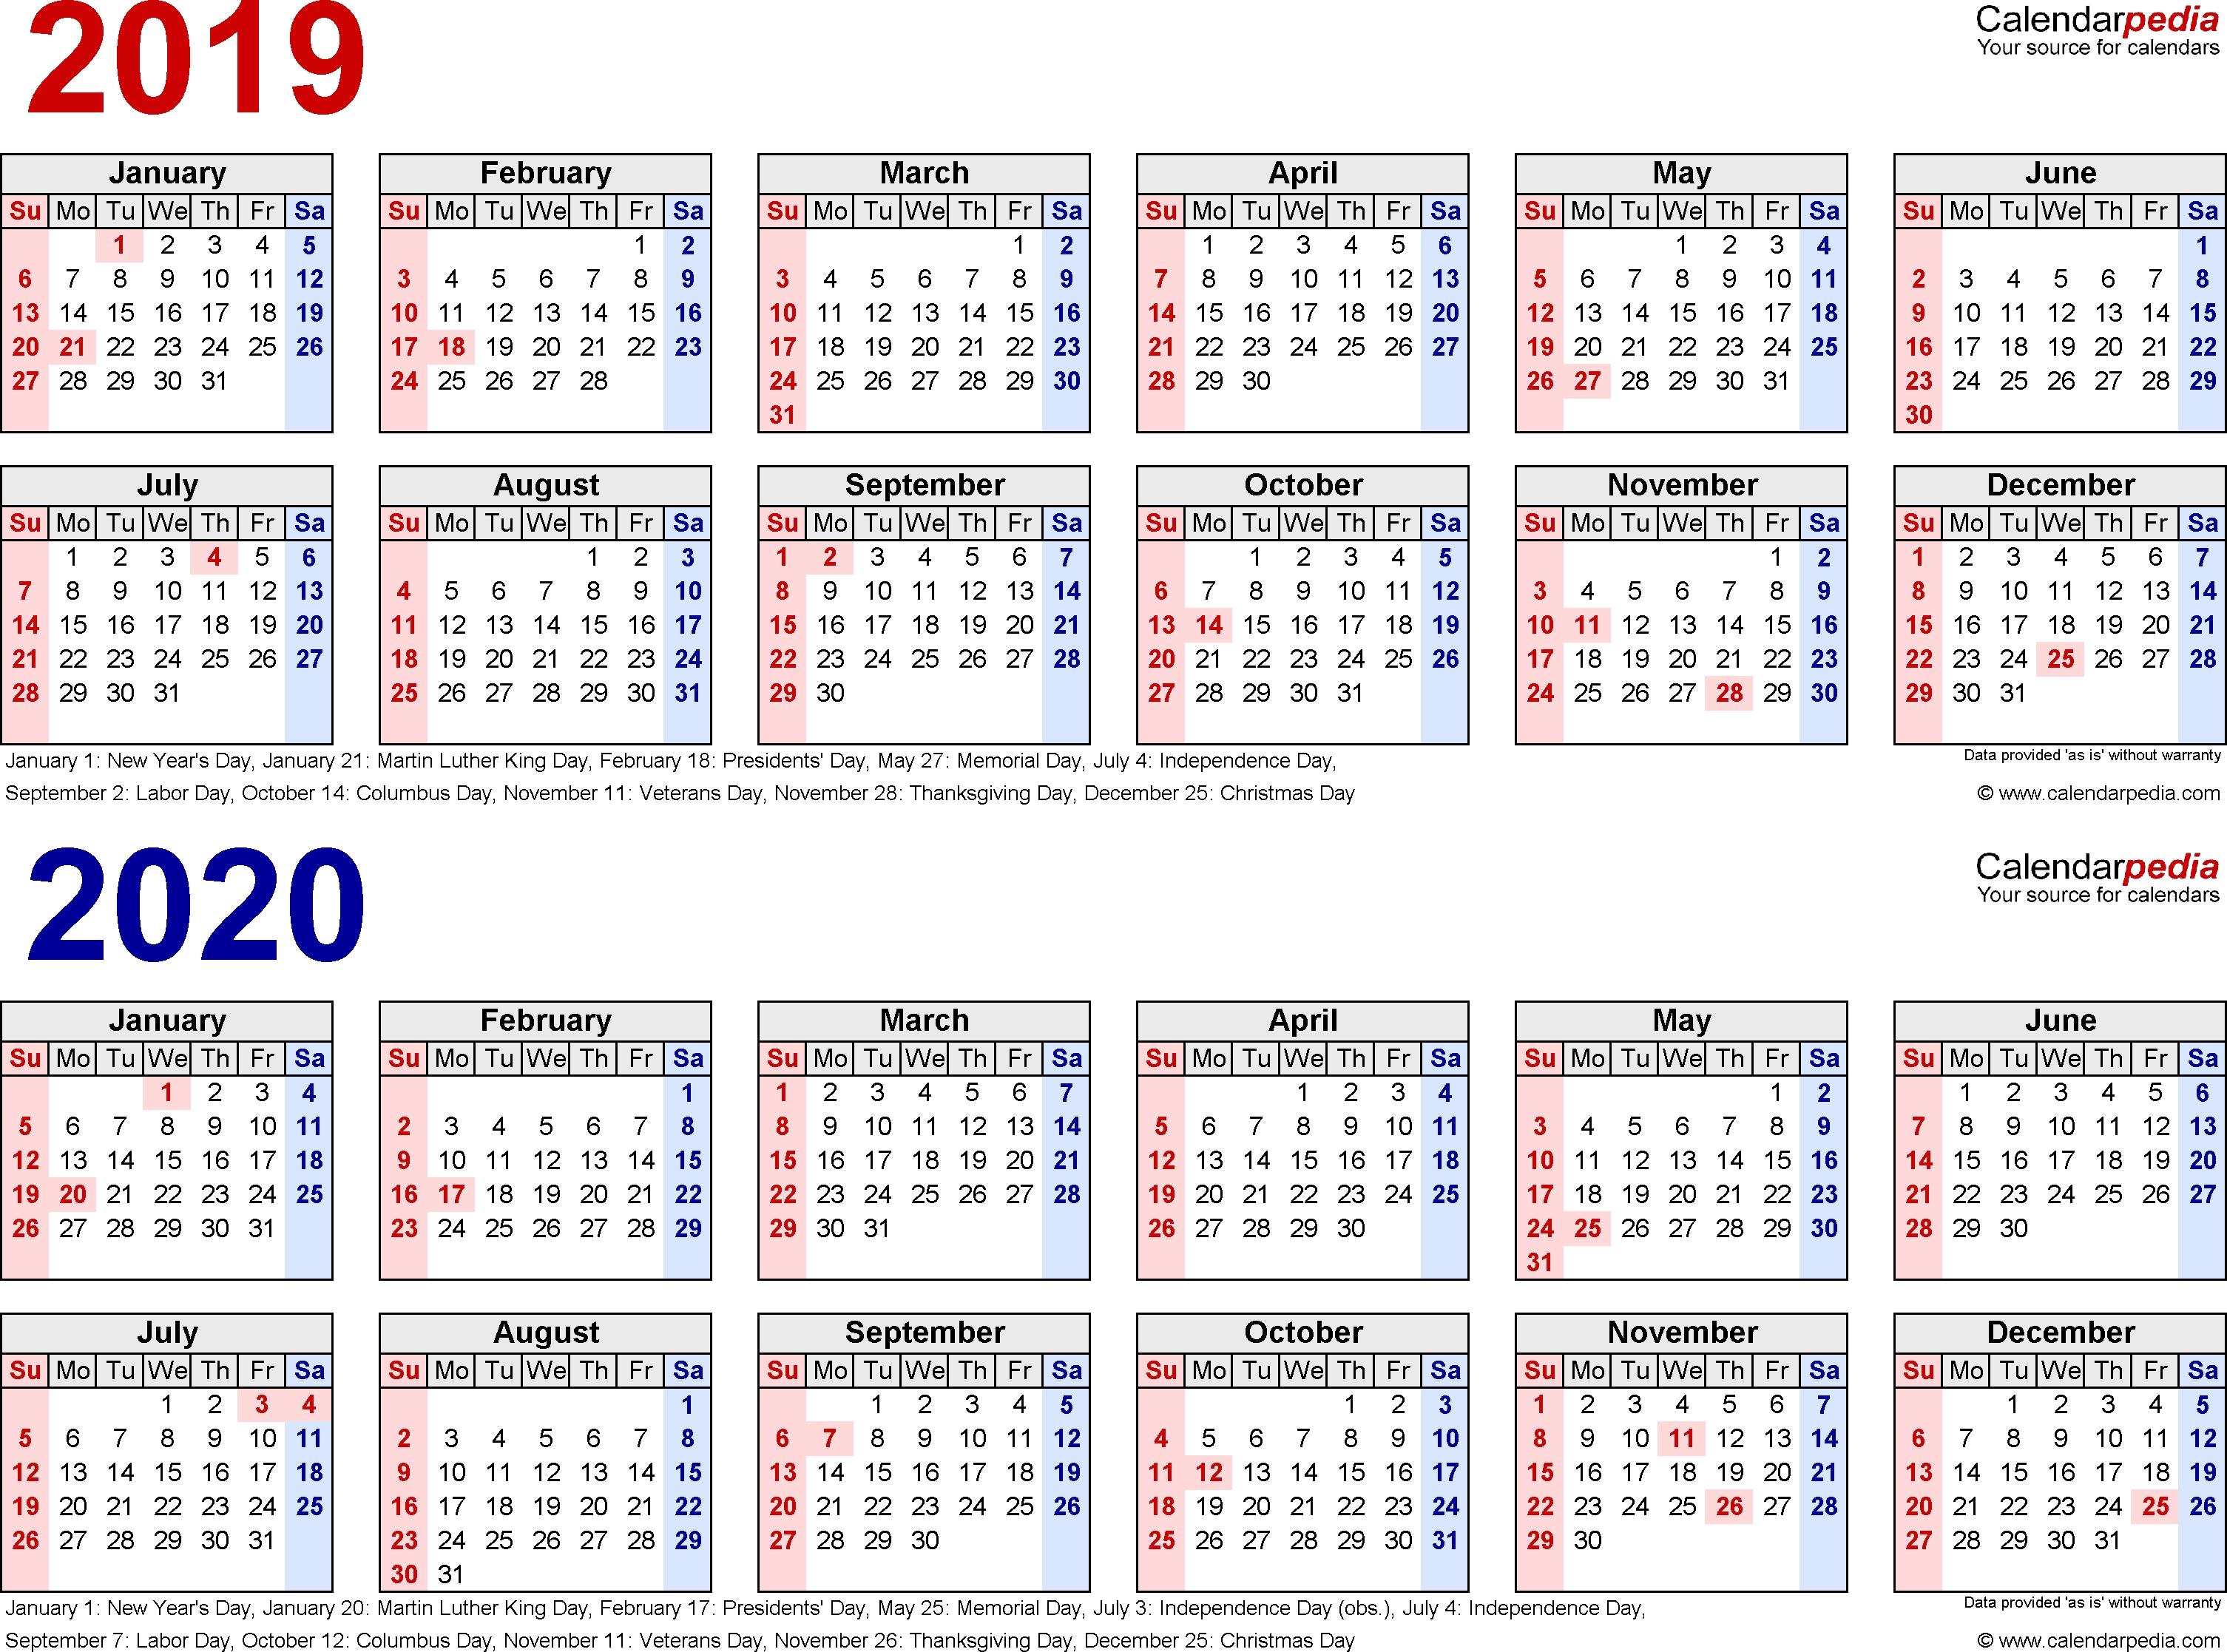 2019-2020 Calendar - Free Printable Two-Year Word Calendars throughout Free Fillable Printable 2019 2020 Calendar